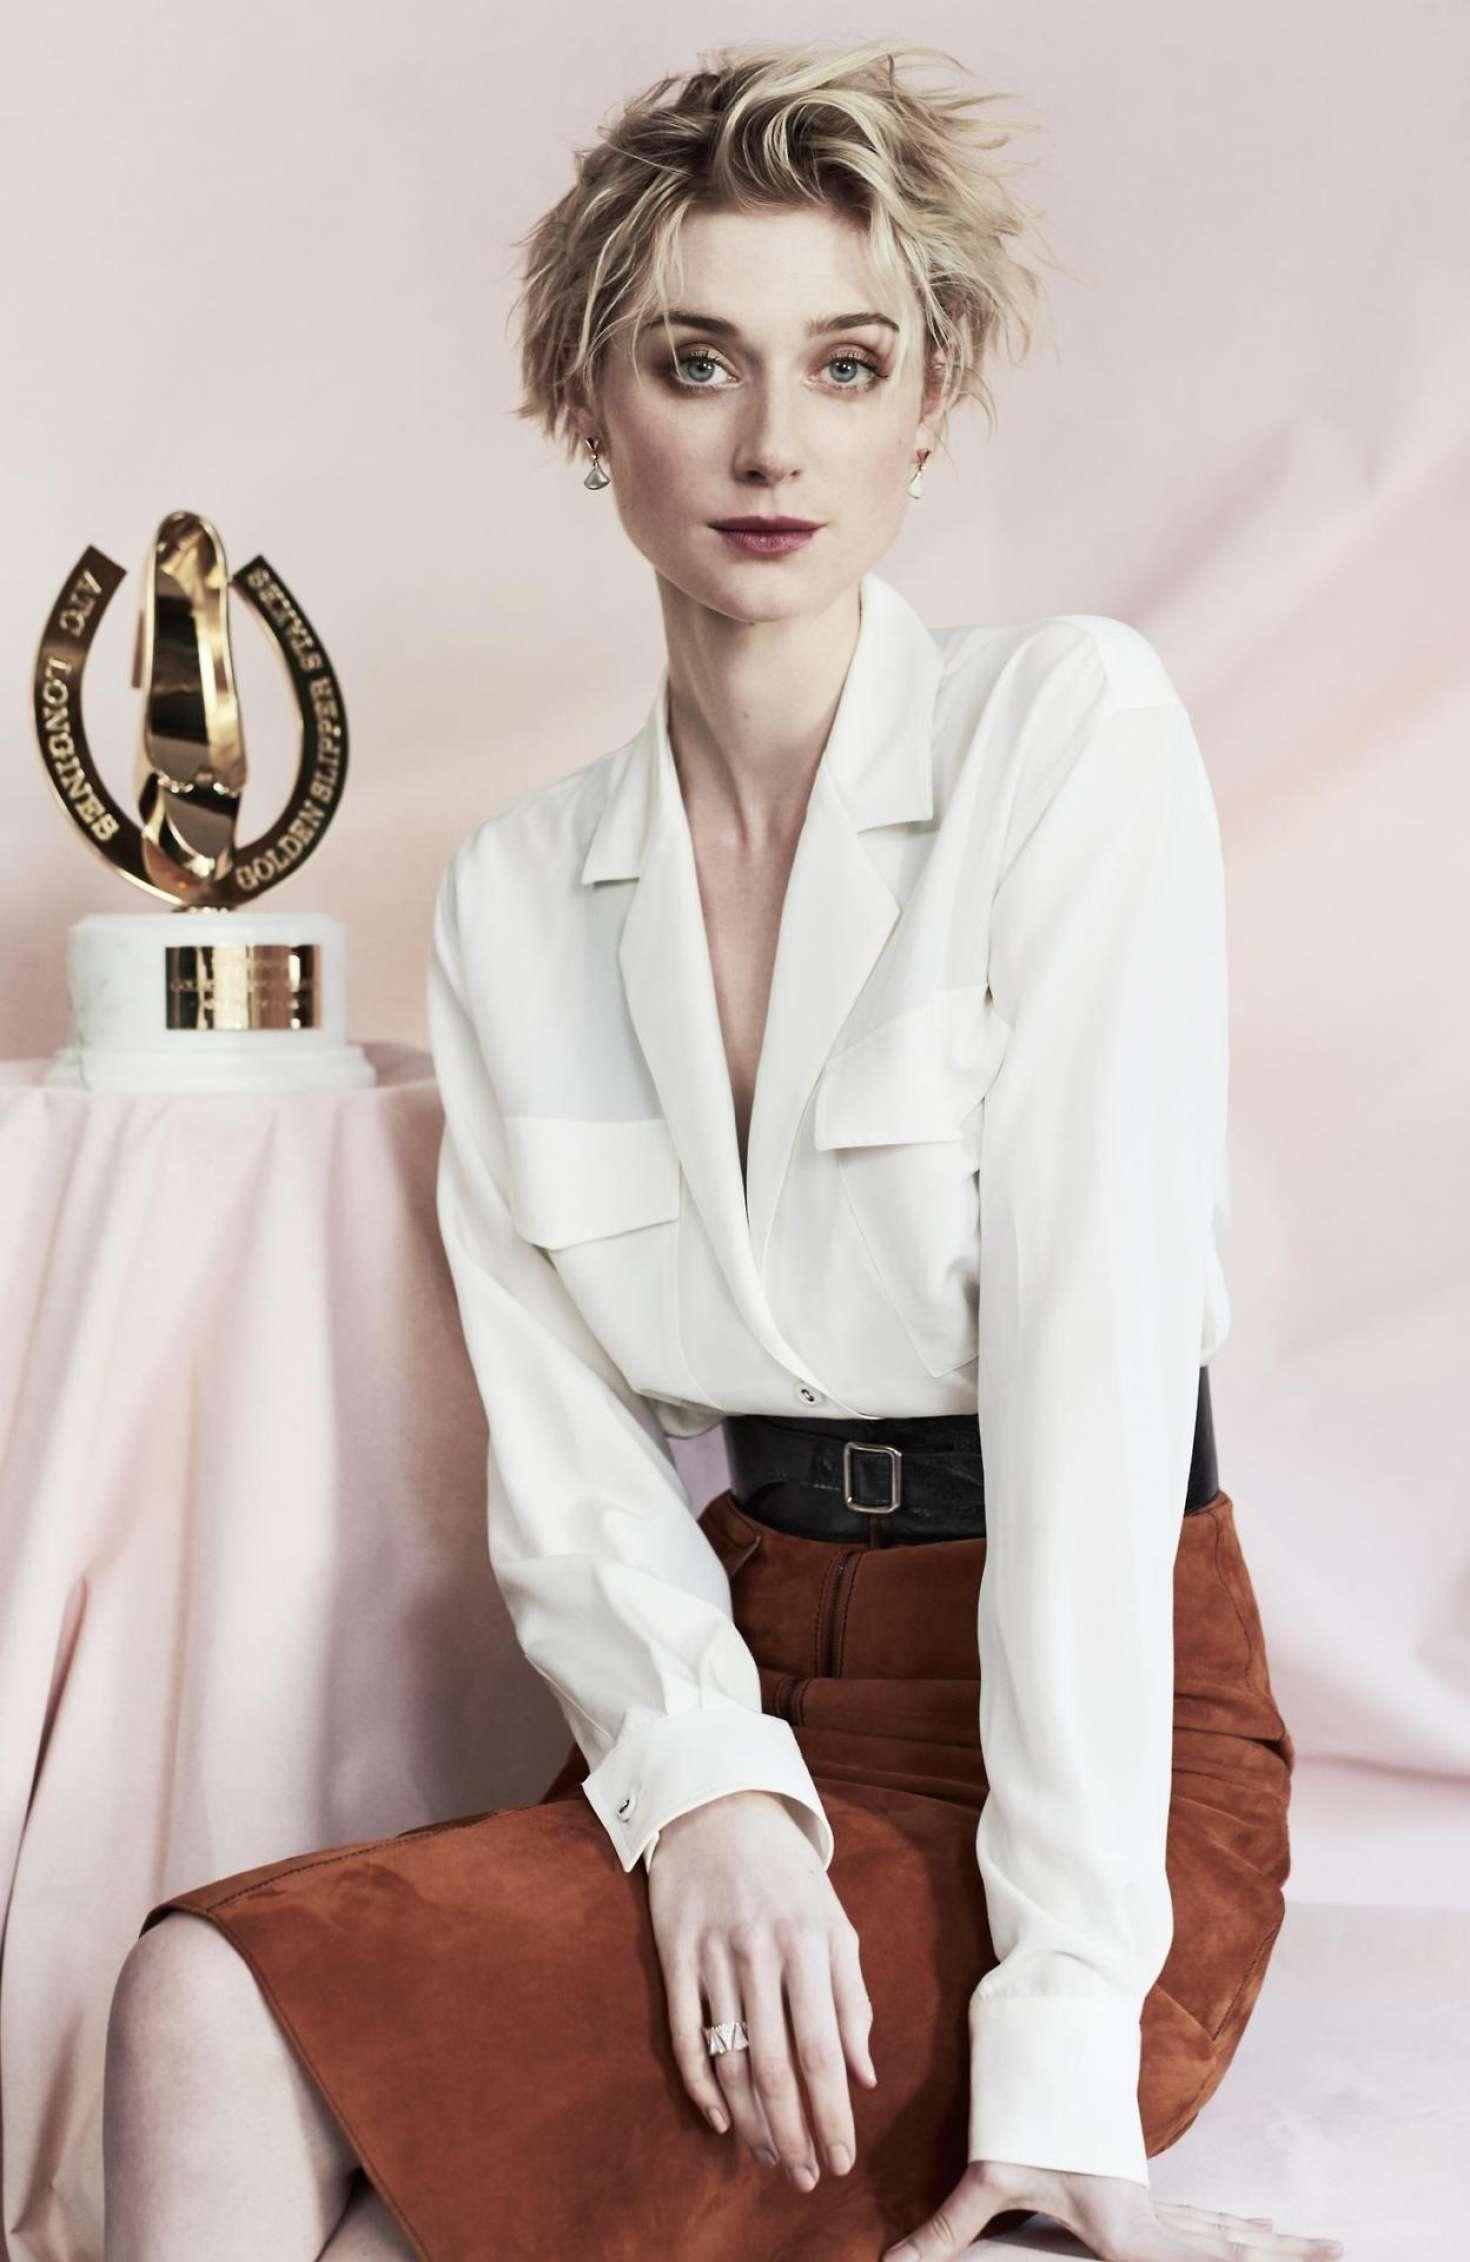 Elizabeth Debicki for Stellar Magazine (March 2017)